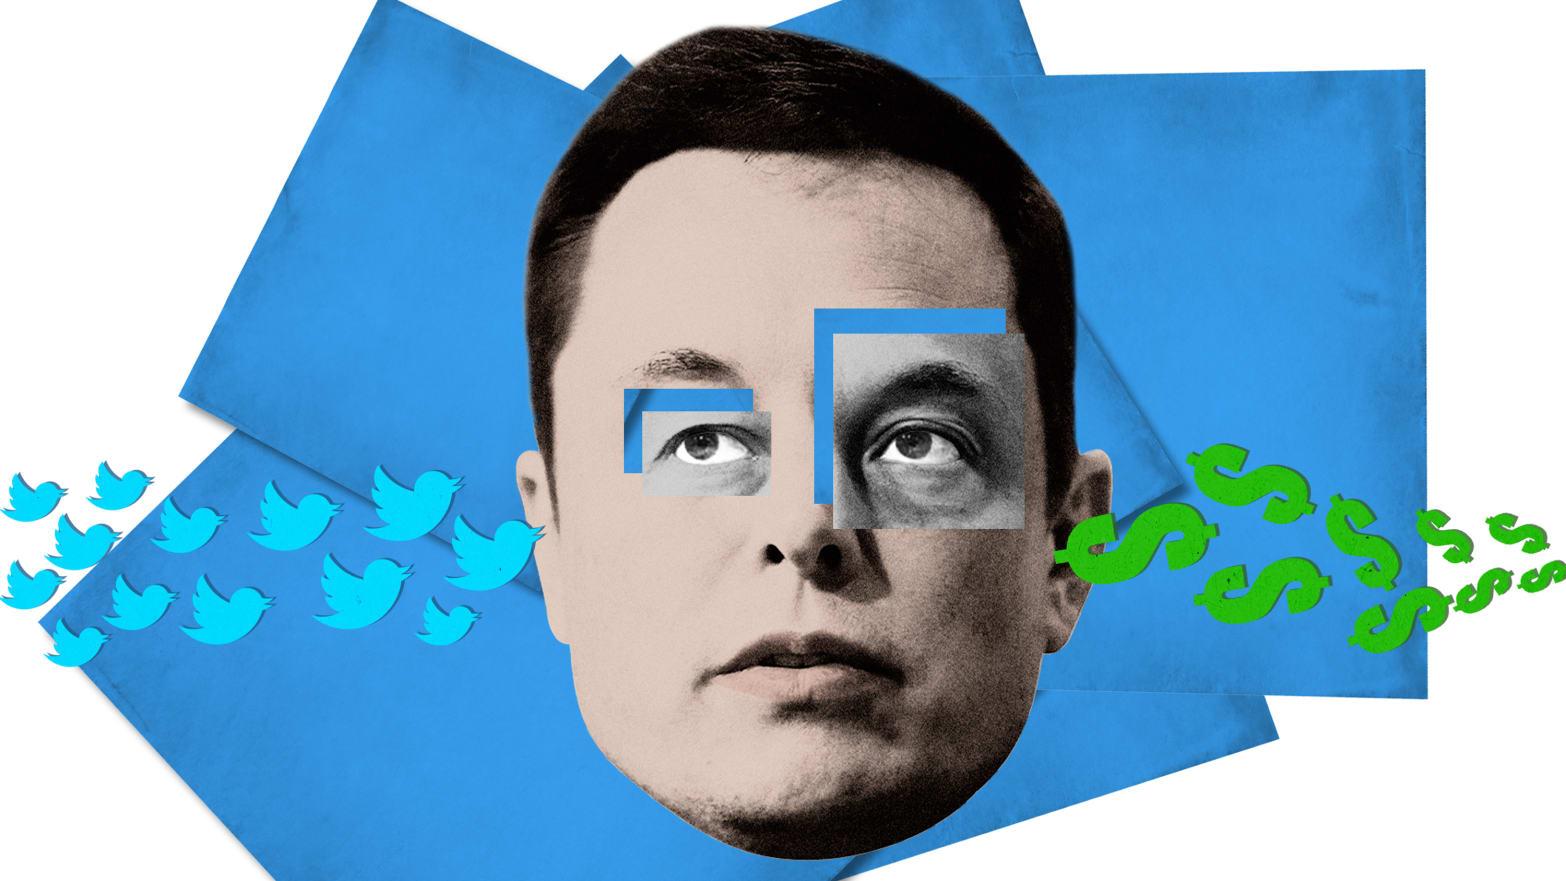 Vernon Unsworth 'Pedo Guy' Lawsuit: Elon Musk Keeps Tweeting Away His Money